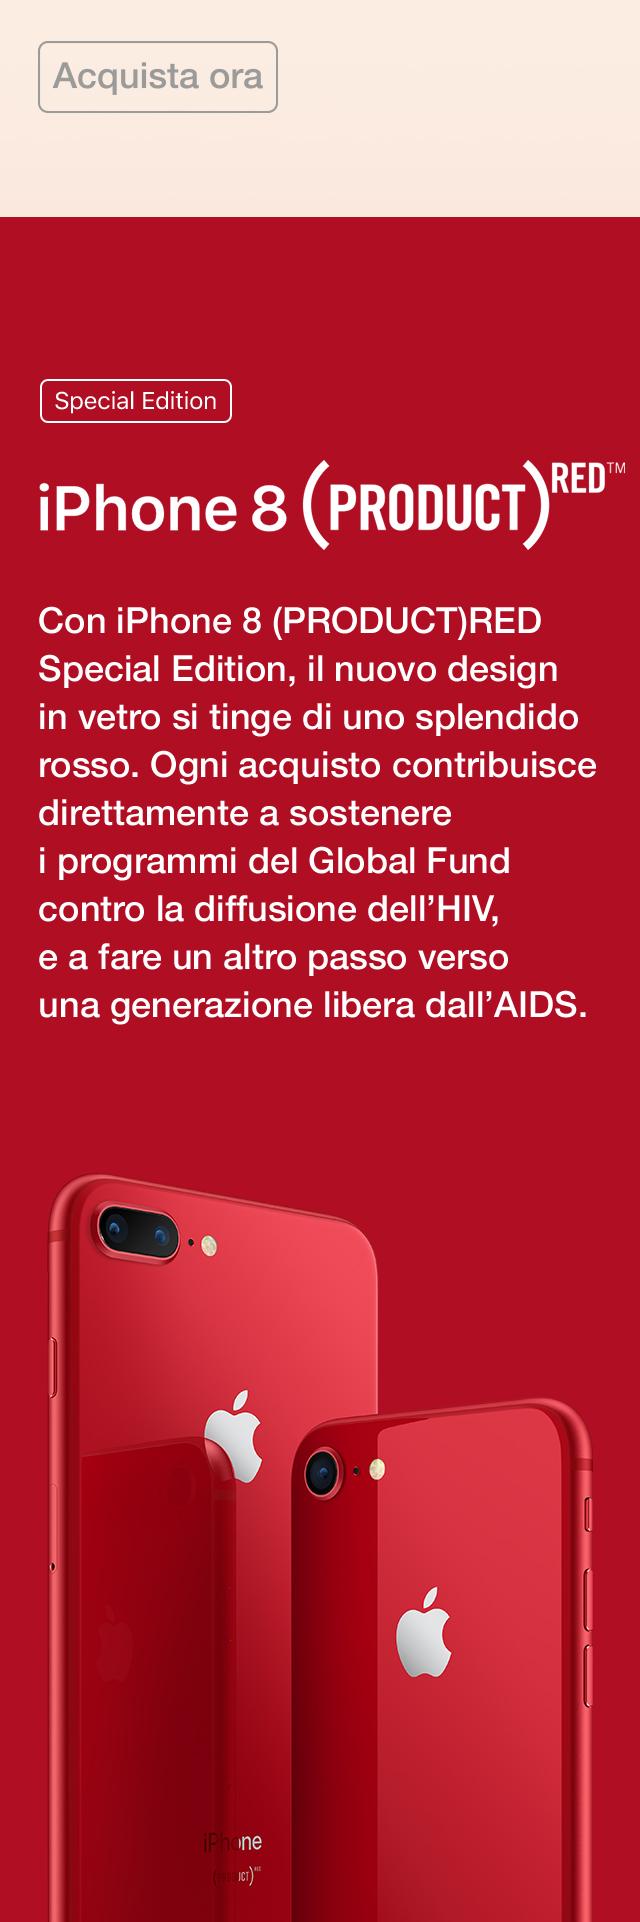 Iphone 8 Offerte Unieuro